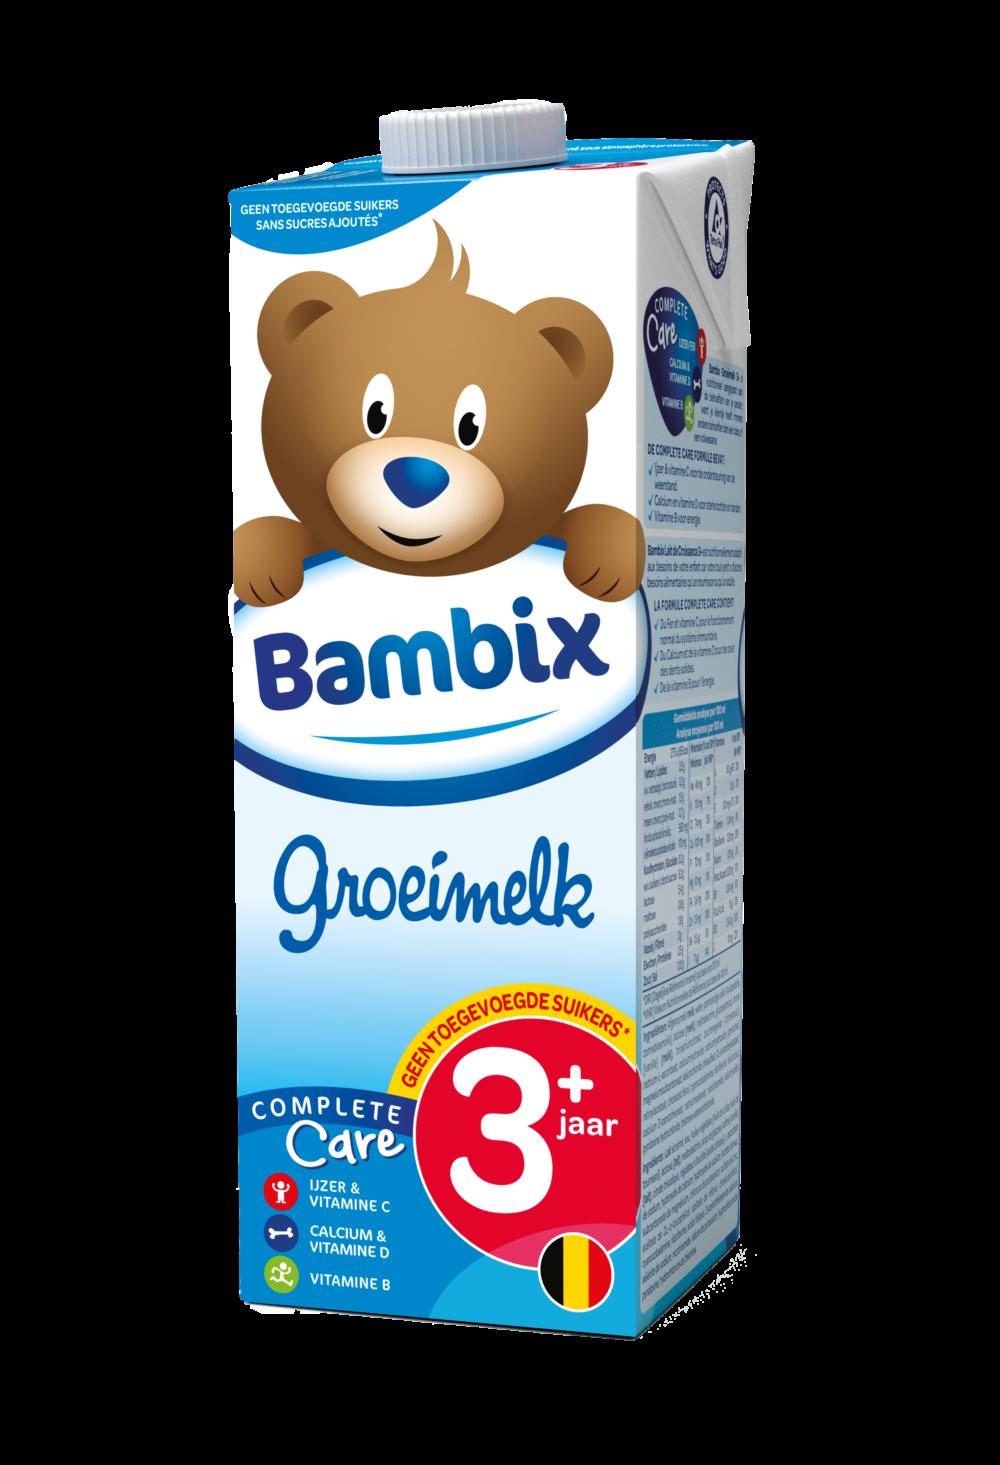 Bambix groeimelk 3+